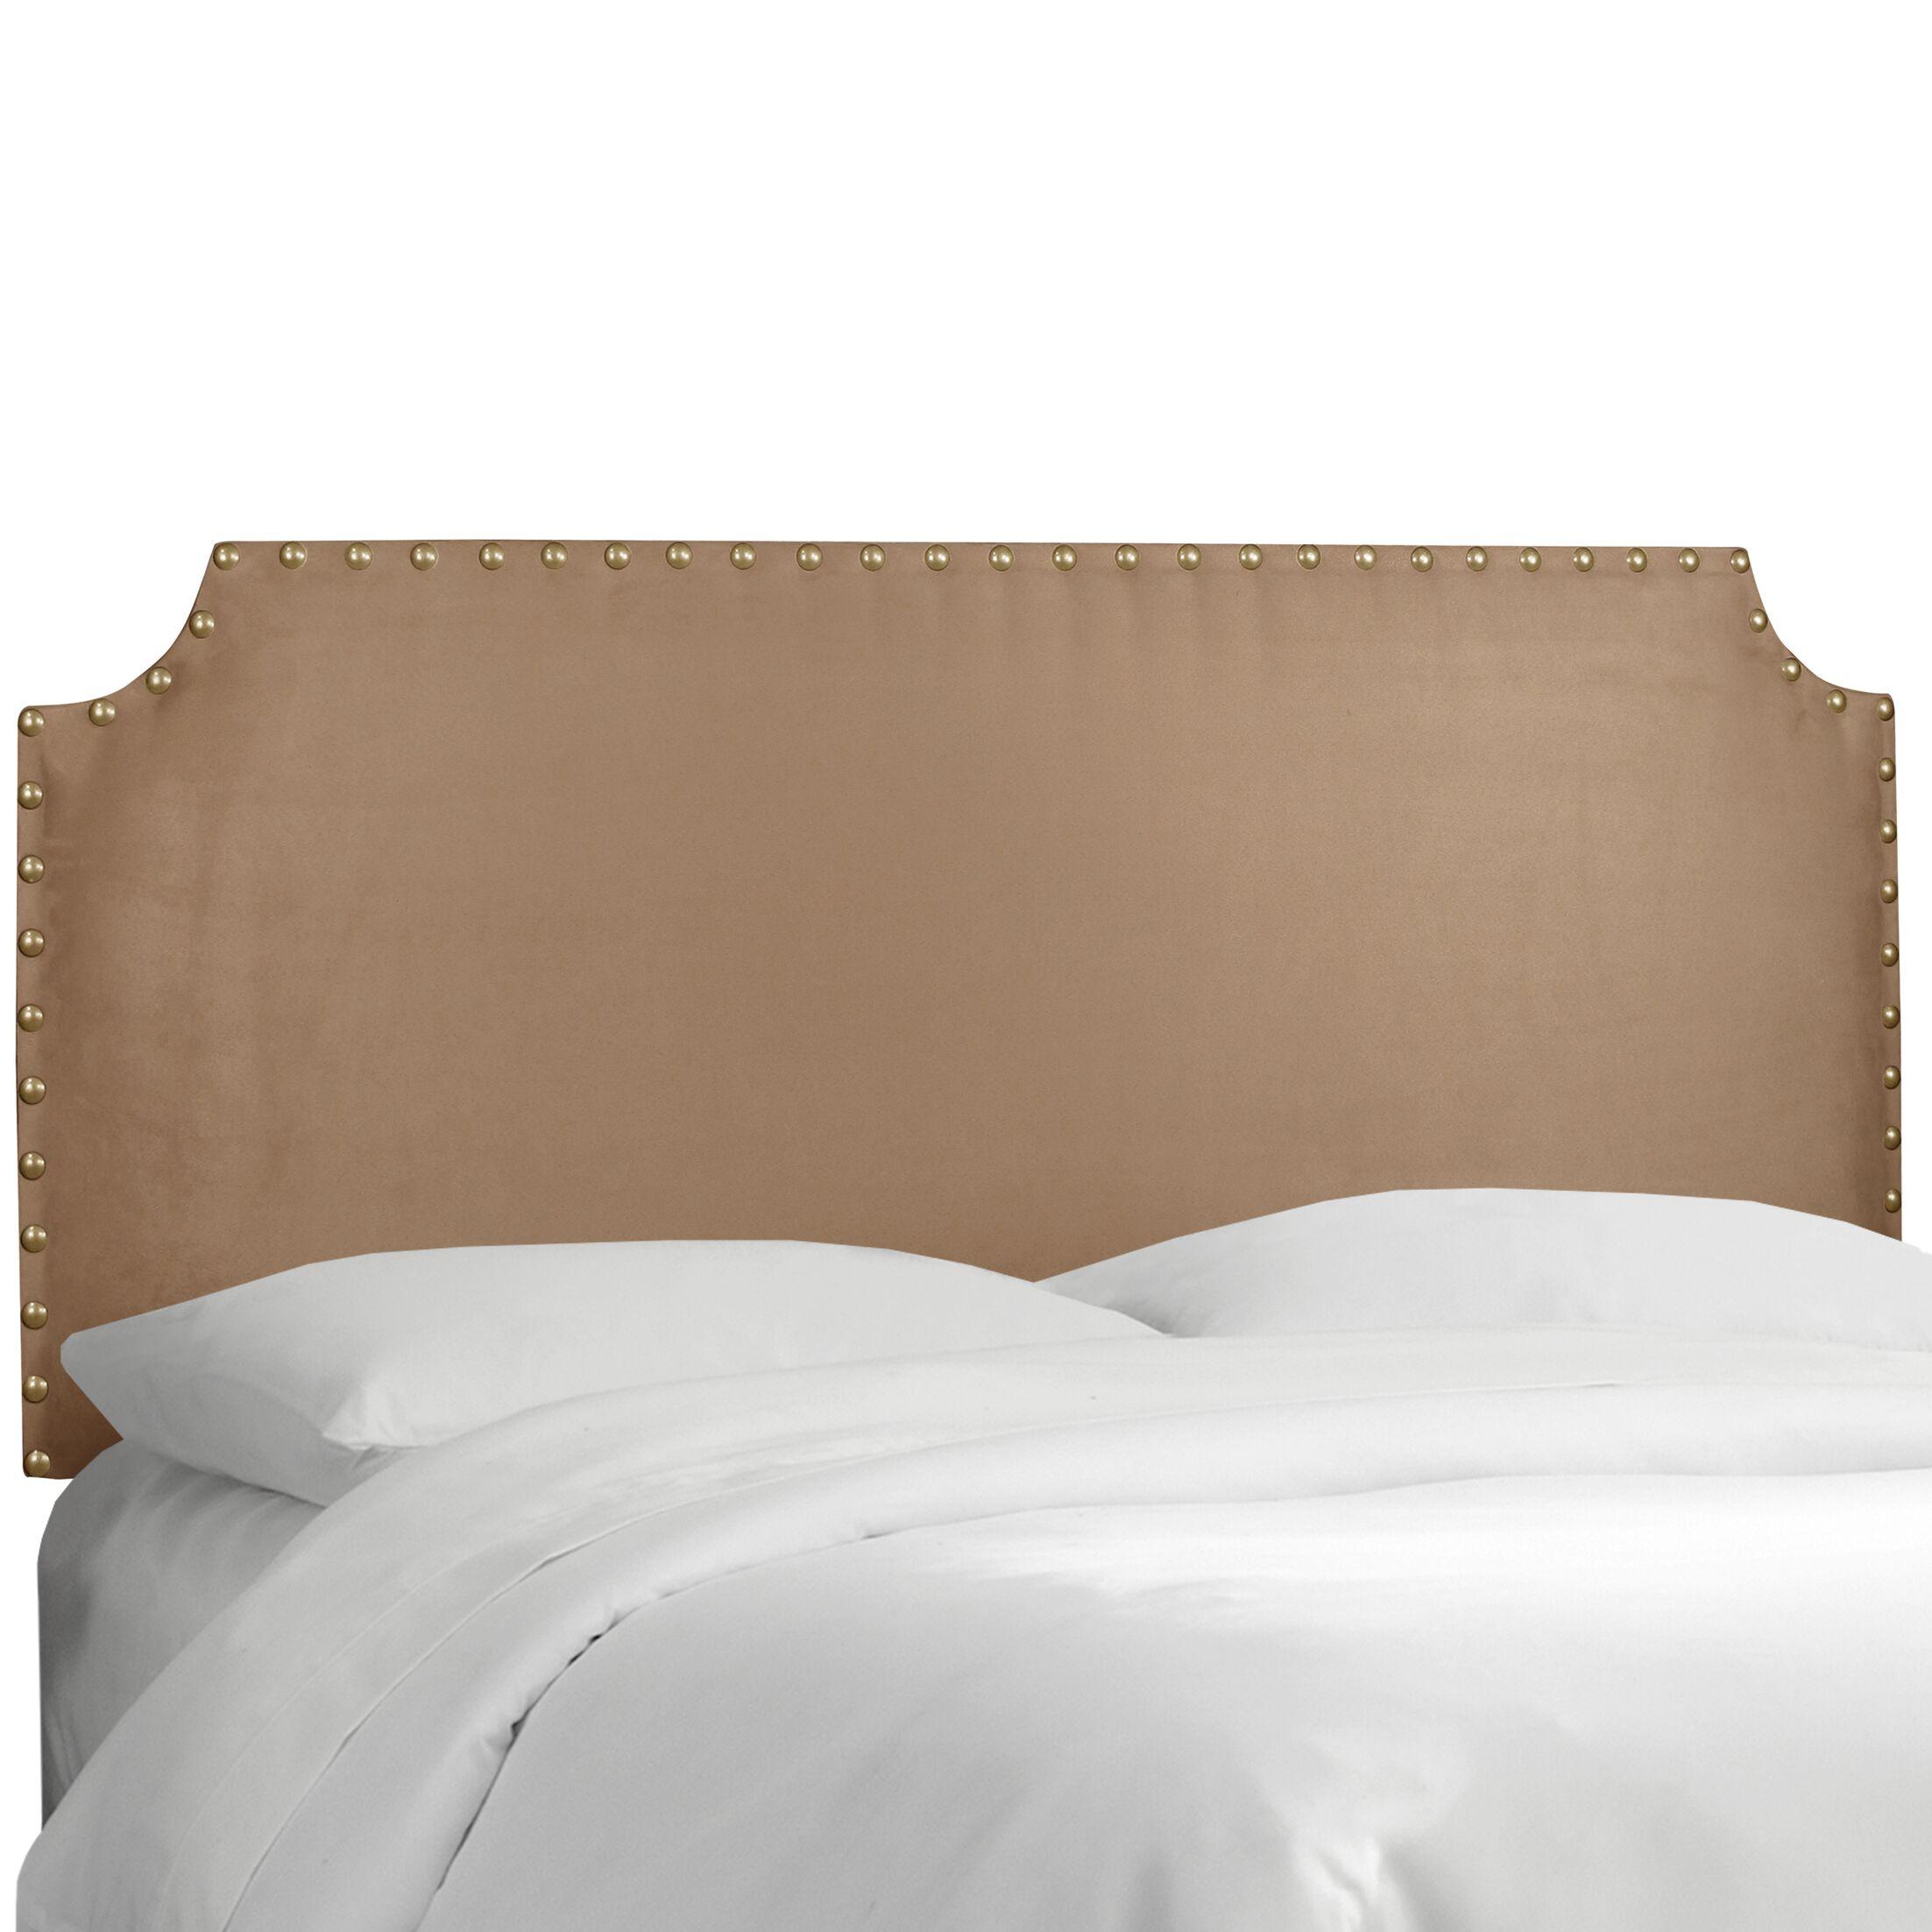 Adelia Upholstered Panel Headboard Size: California King, Upholstery: Premier Saddle